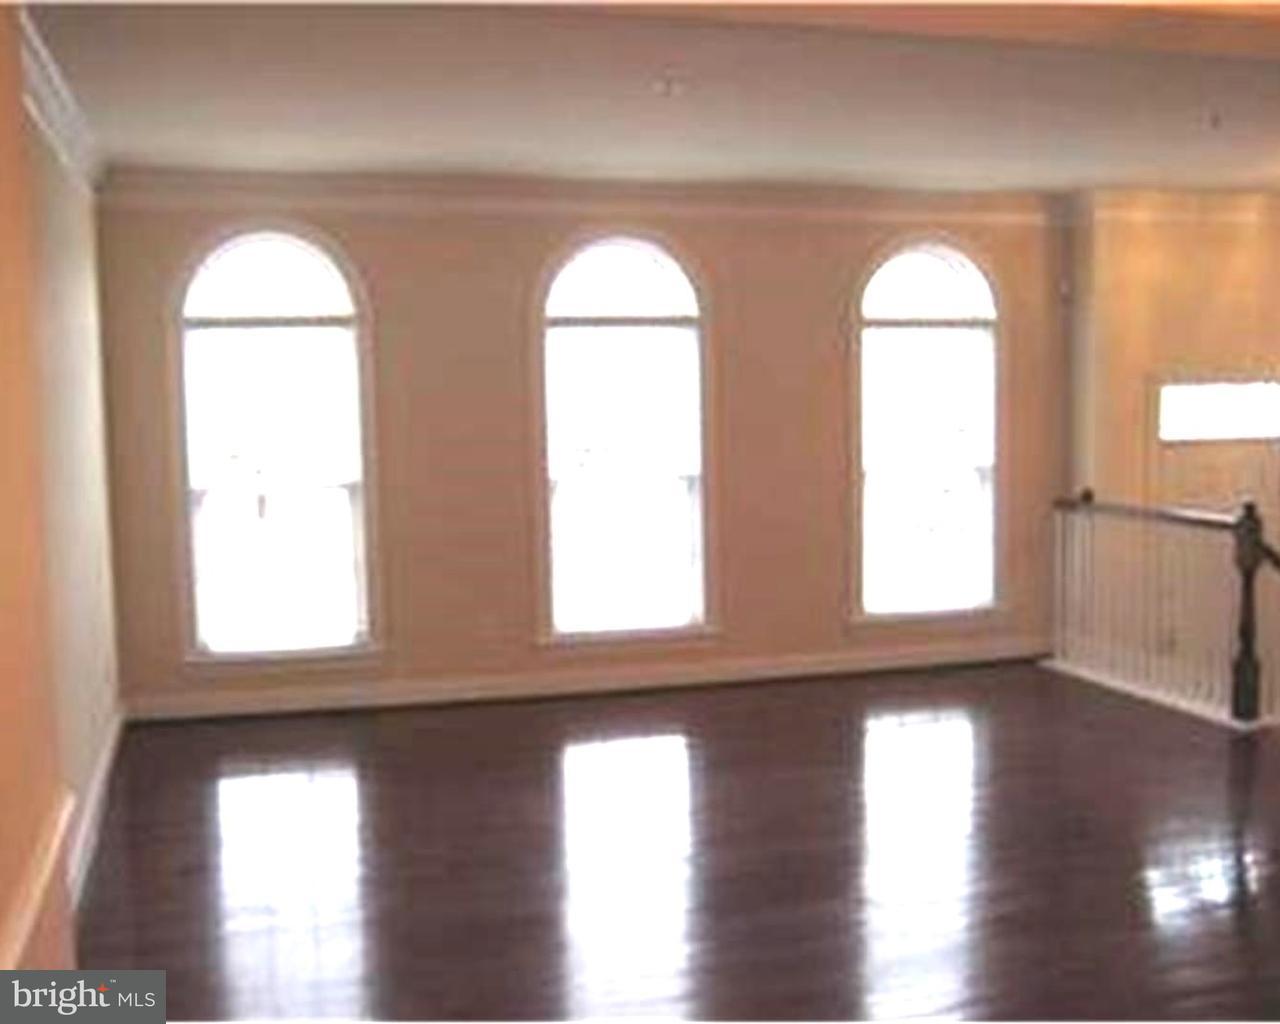 2490 N WHITTMORE ST, BUCKINGHAM - Listed at $2,600, BUCKINGHAM